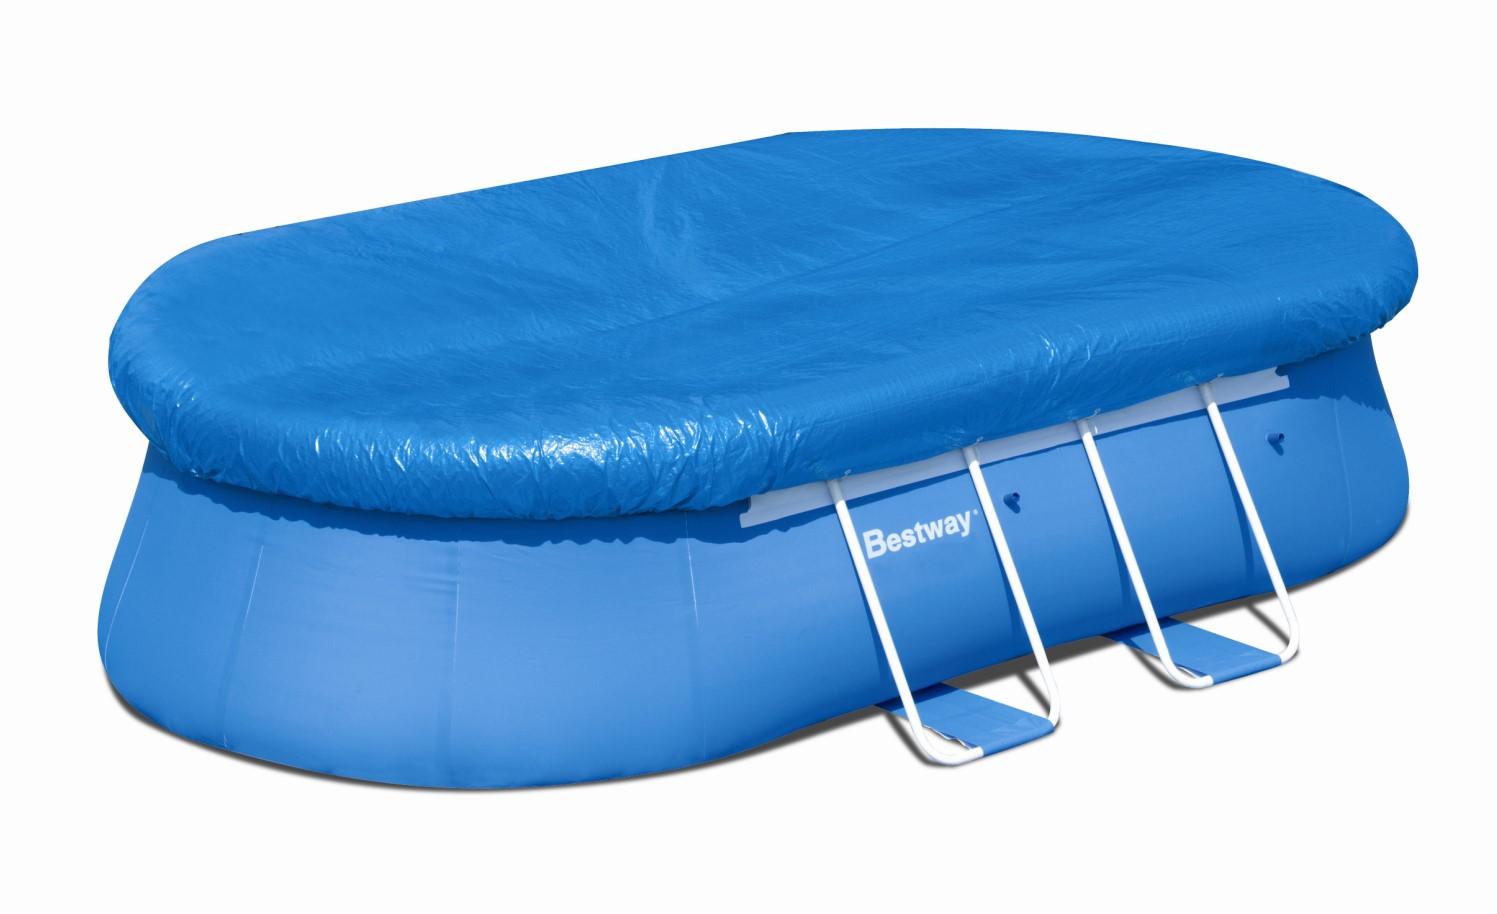 bestway abdeckplane 488 x 305 f r oval fast set pool 58262. Black Bedroom Furniture Sets. Home Design Ideas